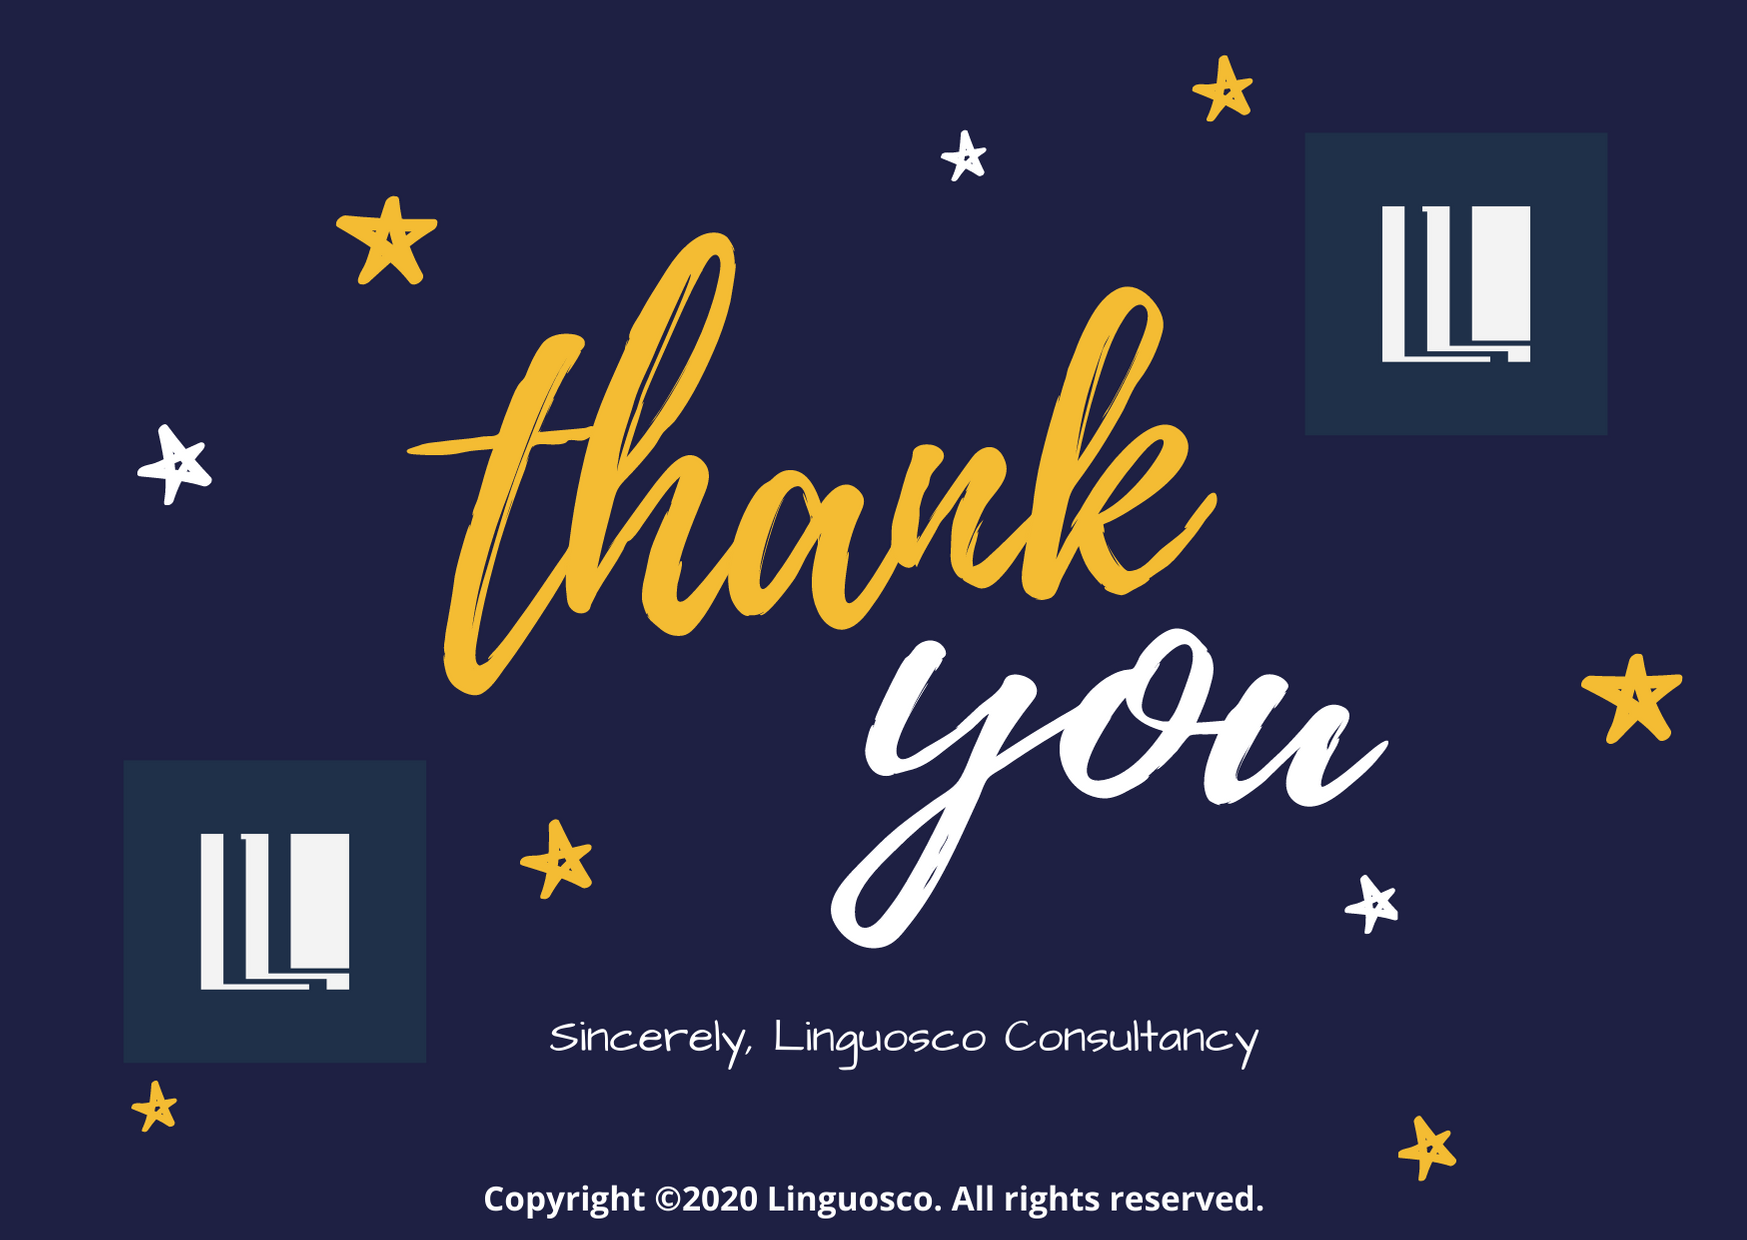 Thank you Dear Customers - Linguosco